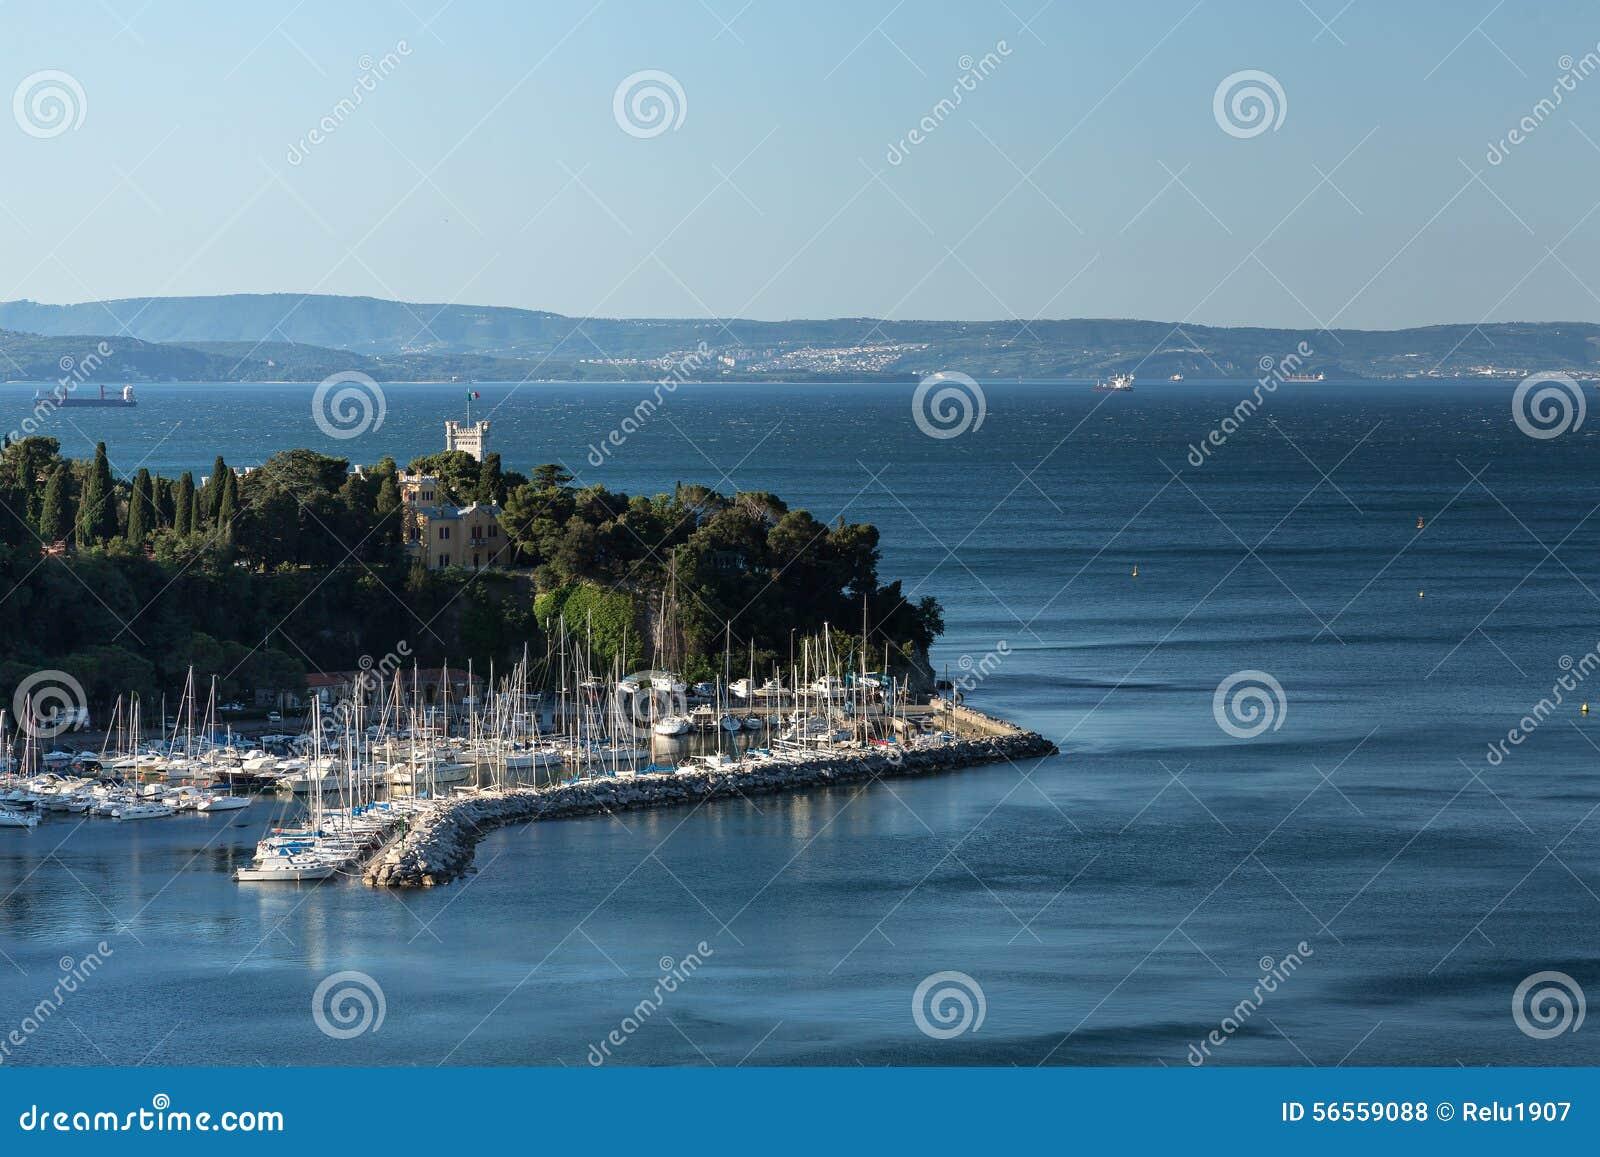 Download Castle στην αδριατική θάλασσα Στοκ Εικόνες - εικόνα από παράκτιος, βουνό: 56559088